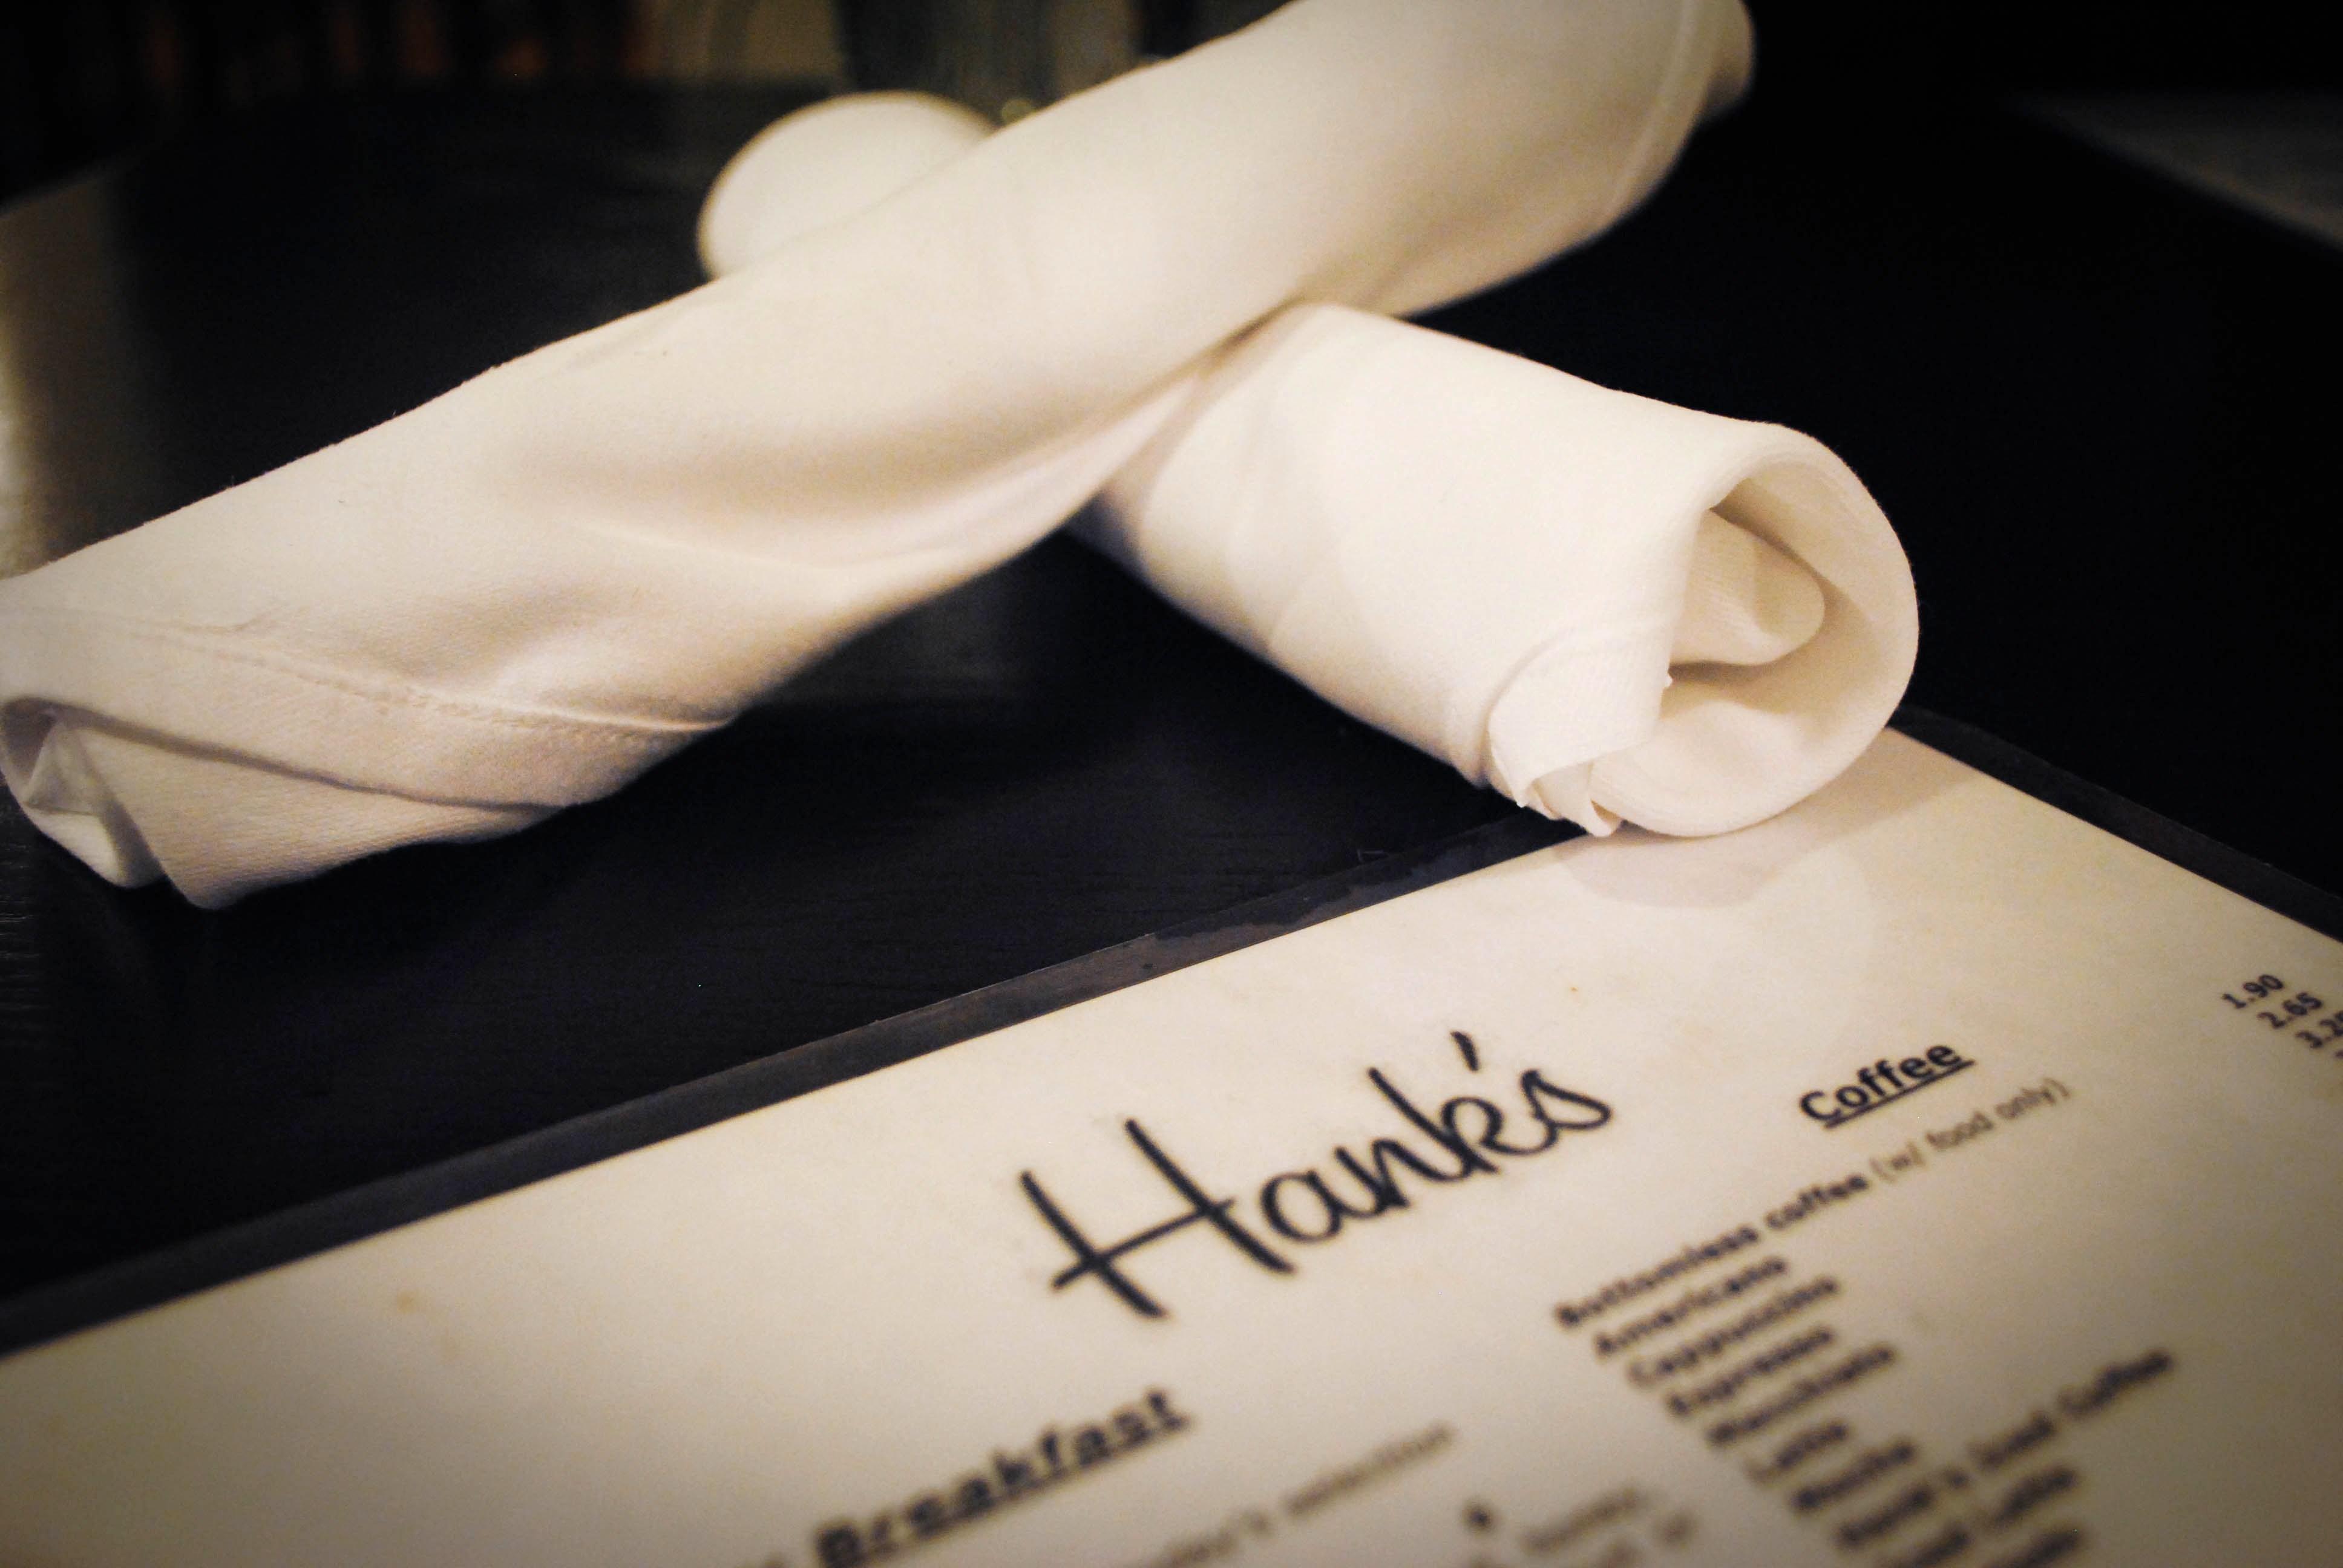 Hank's Cafe